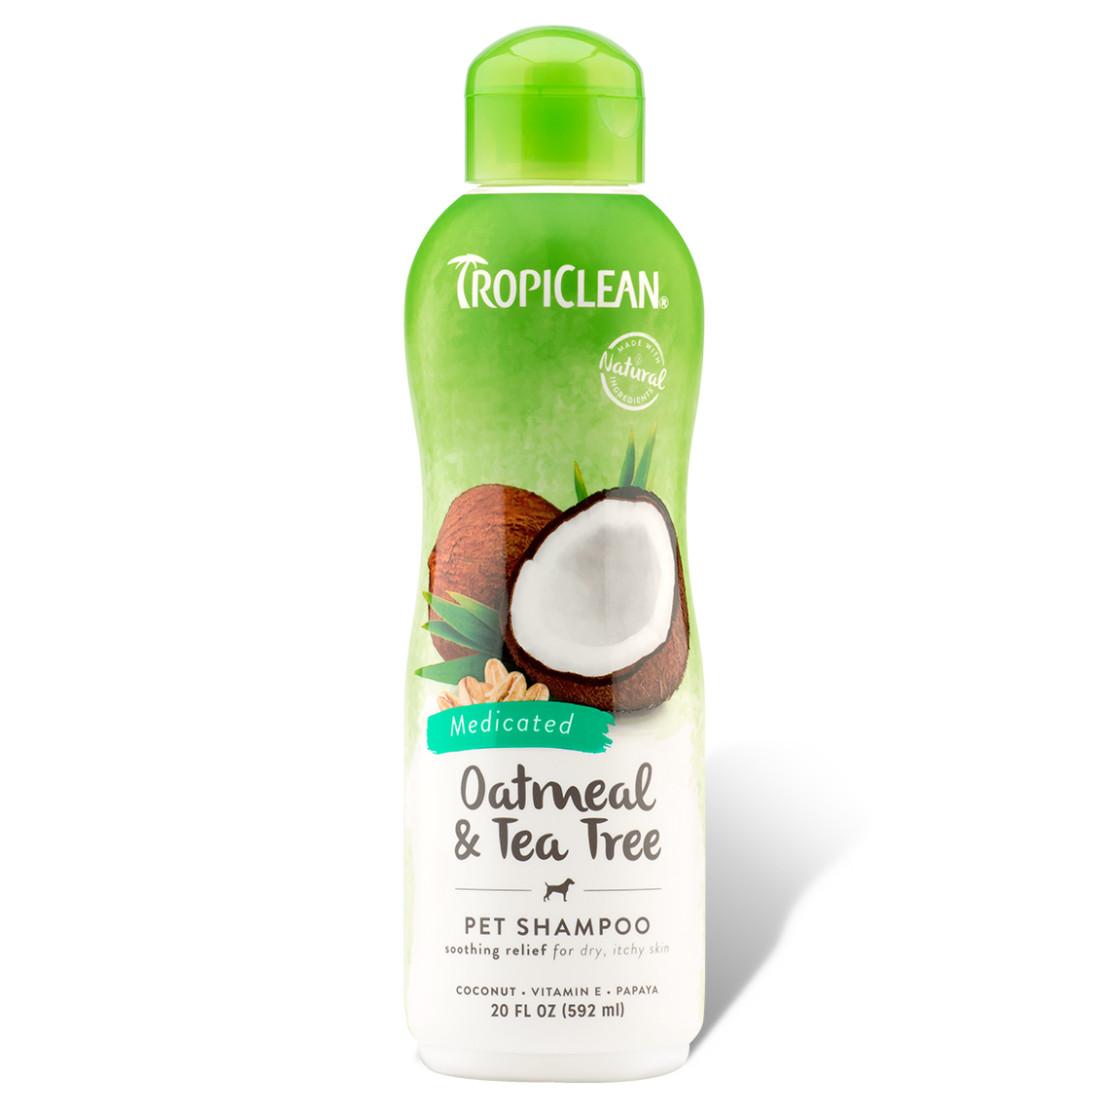 click here to shop TropiClean Oatmeal & Tea Tree Medicated Dog Shampoo